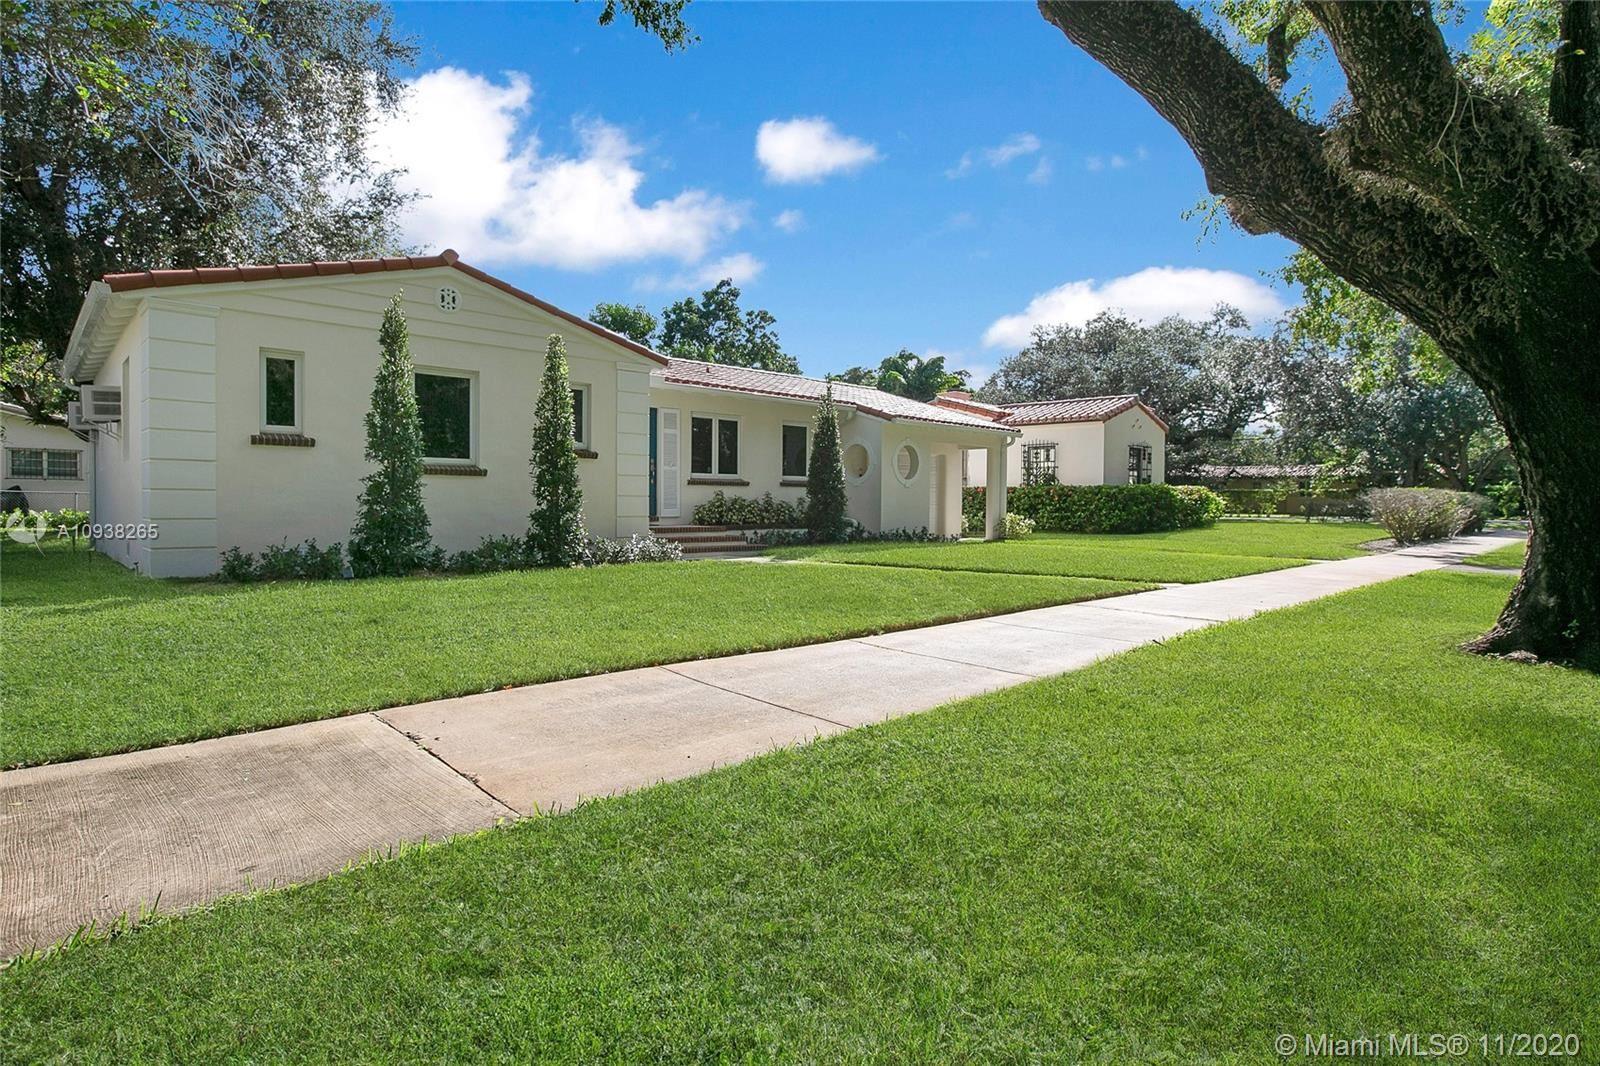 750 Malaga Ave, Coral Gables, FL 33134 - #: A10938265